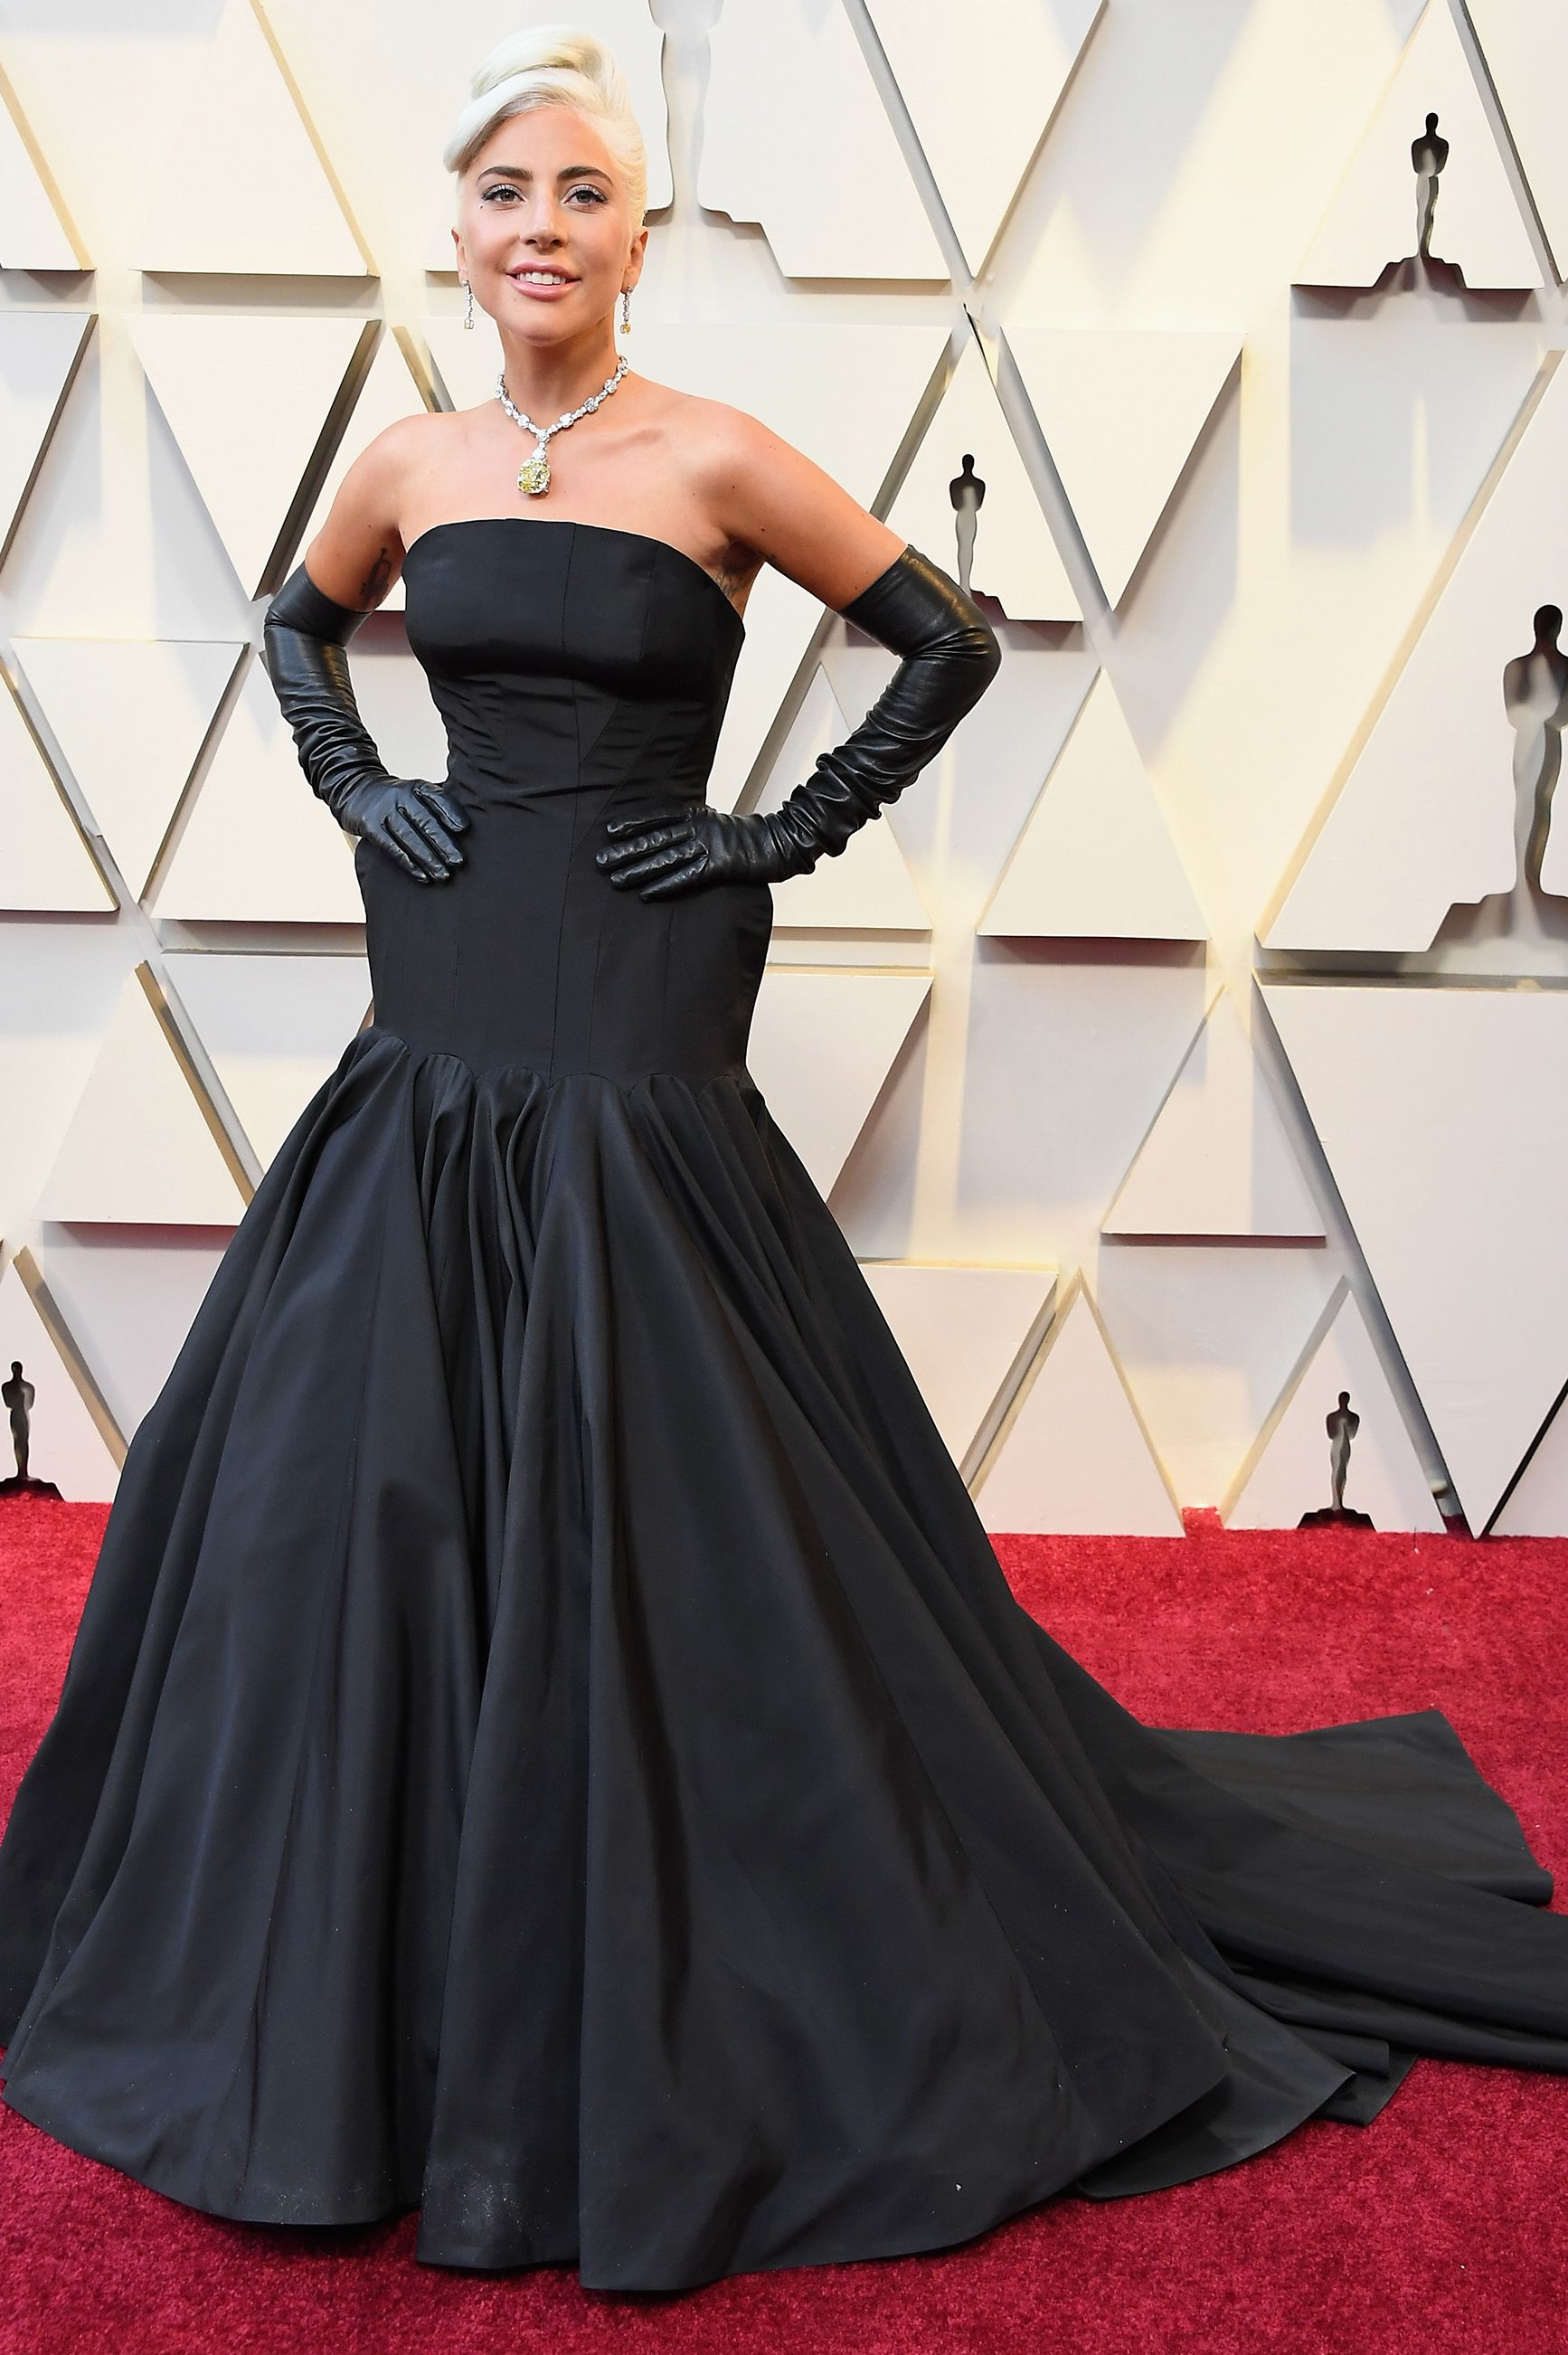 Lady Gaga oSCARS RED CARPET 2019